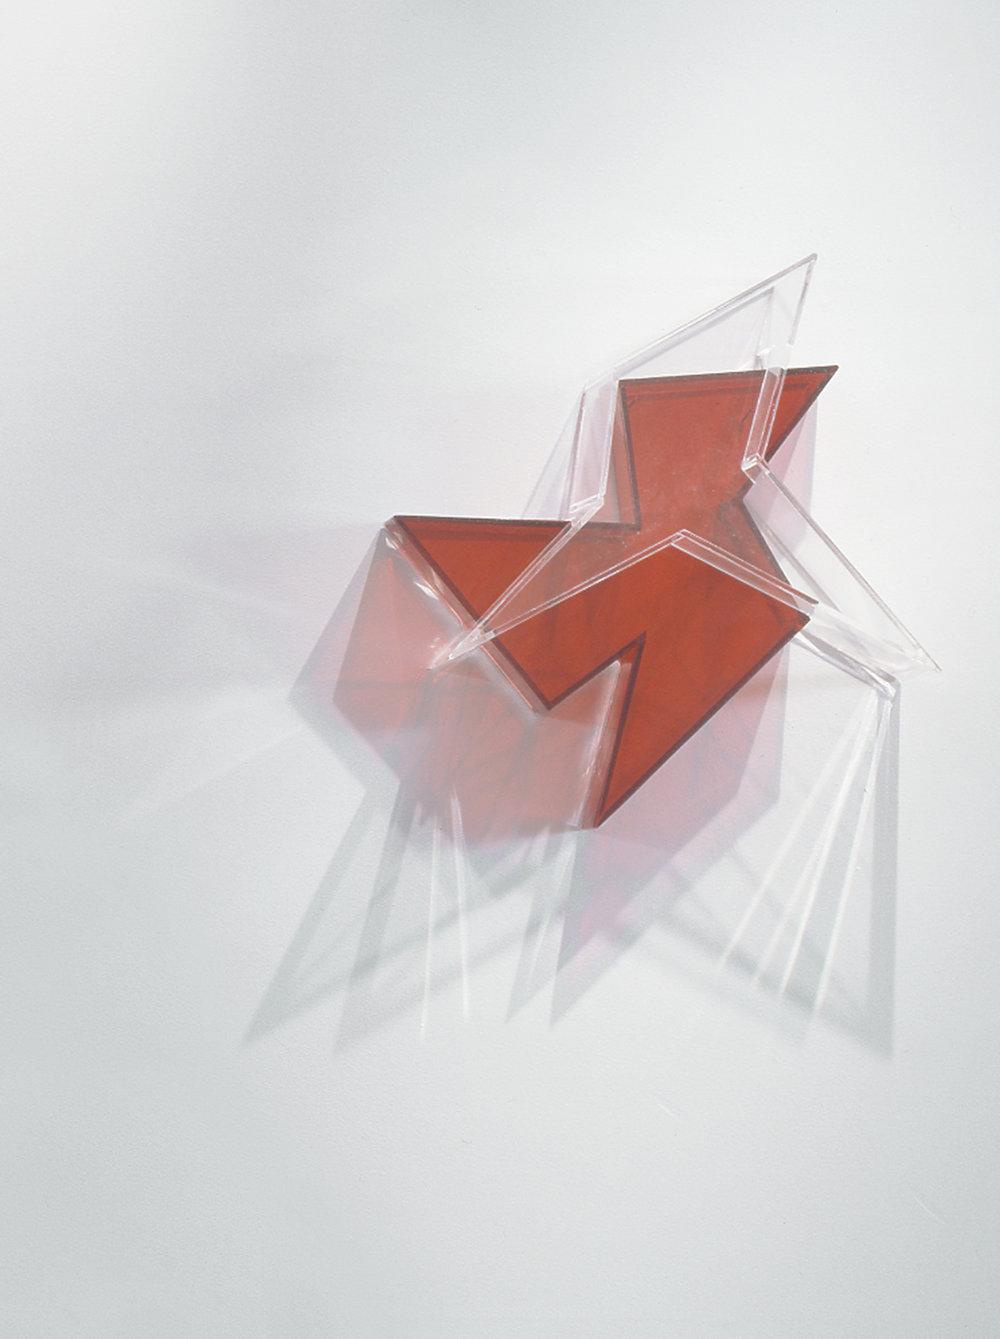 Settled Edge  (red) 2004 Plexiglas 4.5Hx18Wx19D inches / 11x46x48 cm